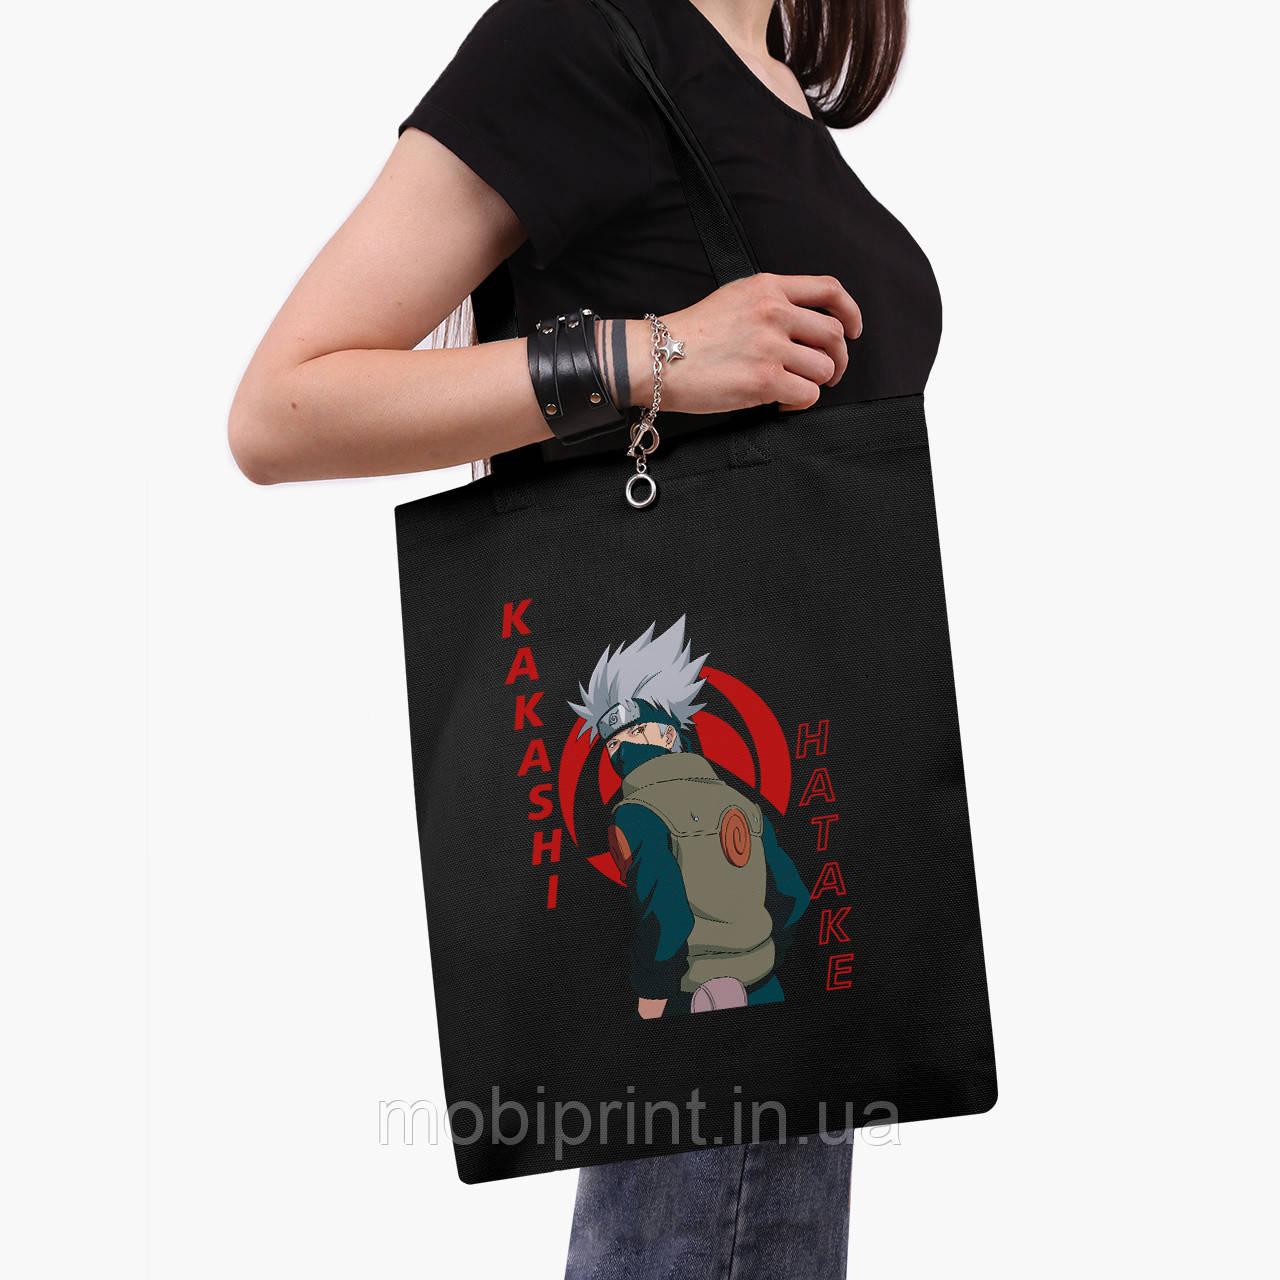 Эко сумка шоппер черная Хатакэ Какаши Наруто (Hatake Kakashi) (9227-2820-2)  41*35 см